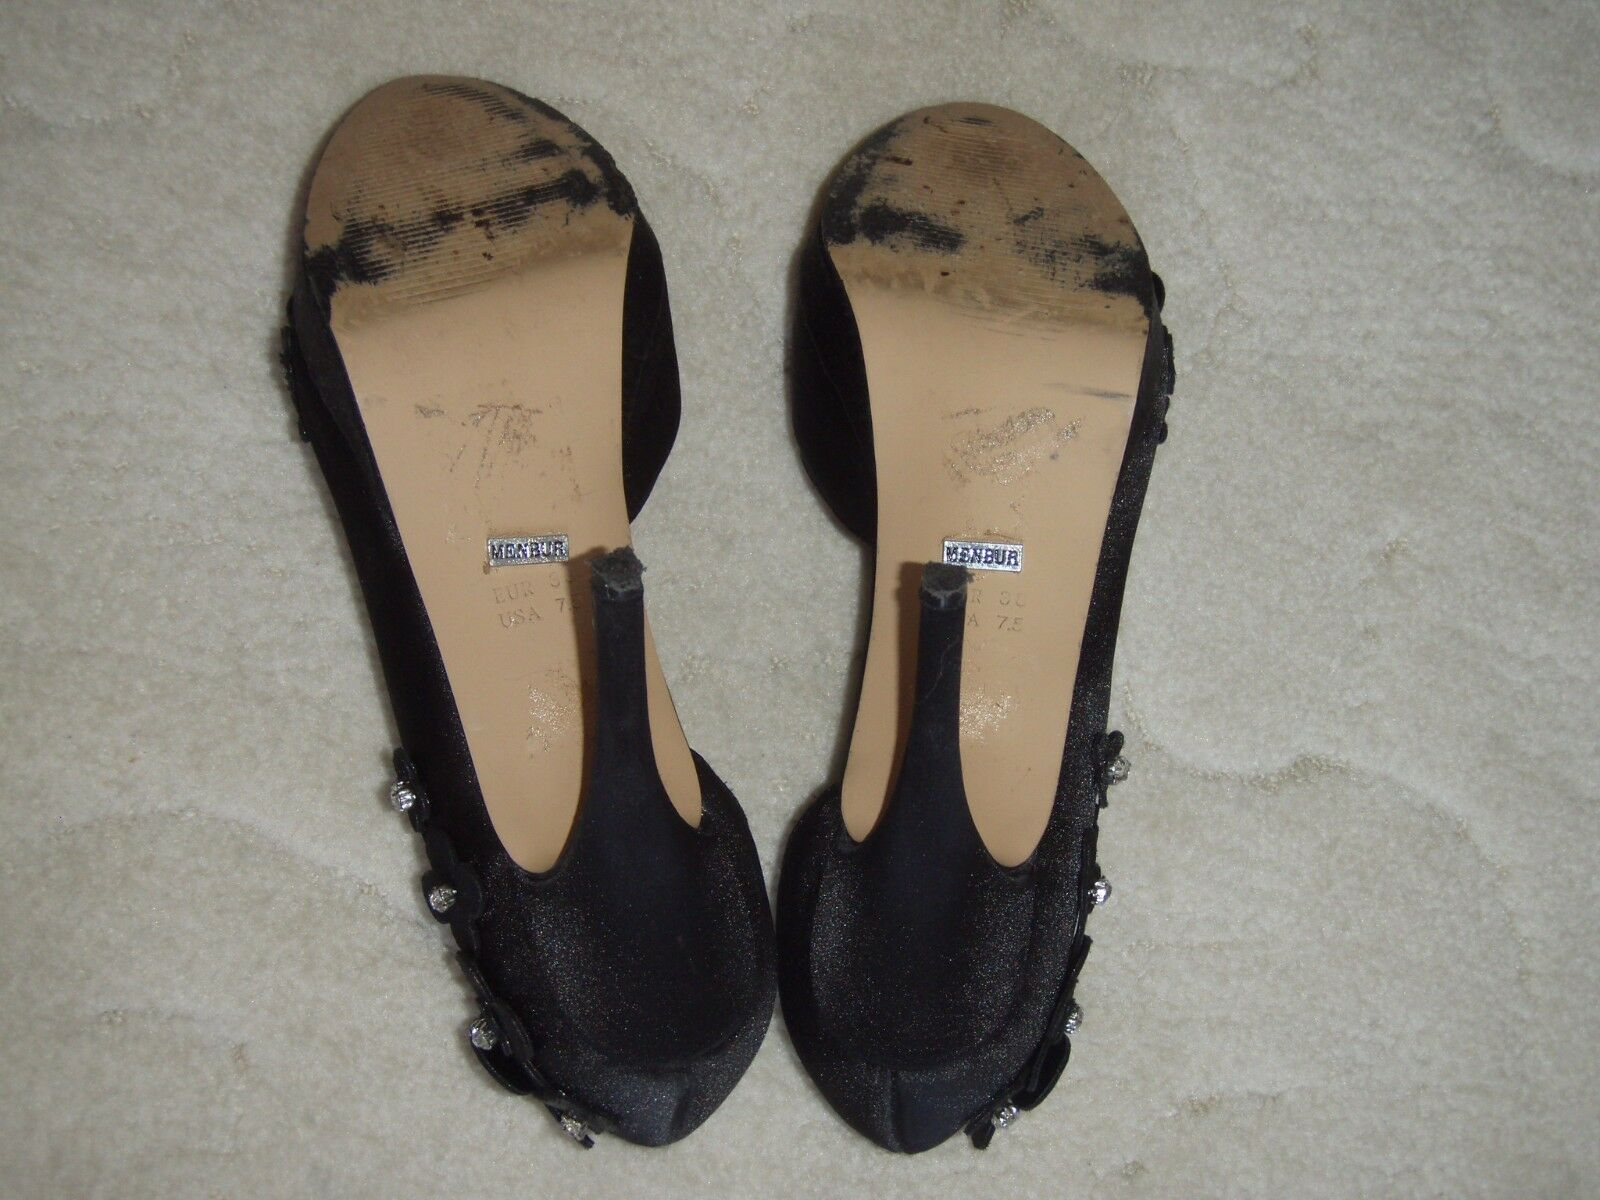 MENBUR - sexy Damen Damen Damen Pumps   Schuhe - Schwarz - Gr. 37   38 - neuwertig 851992